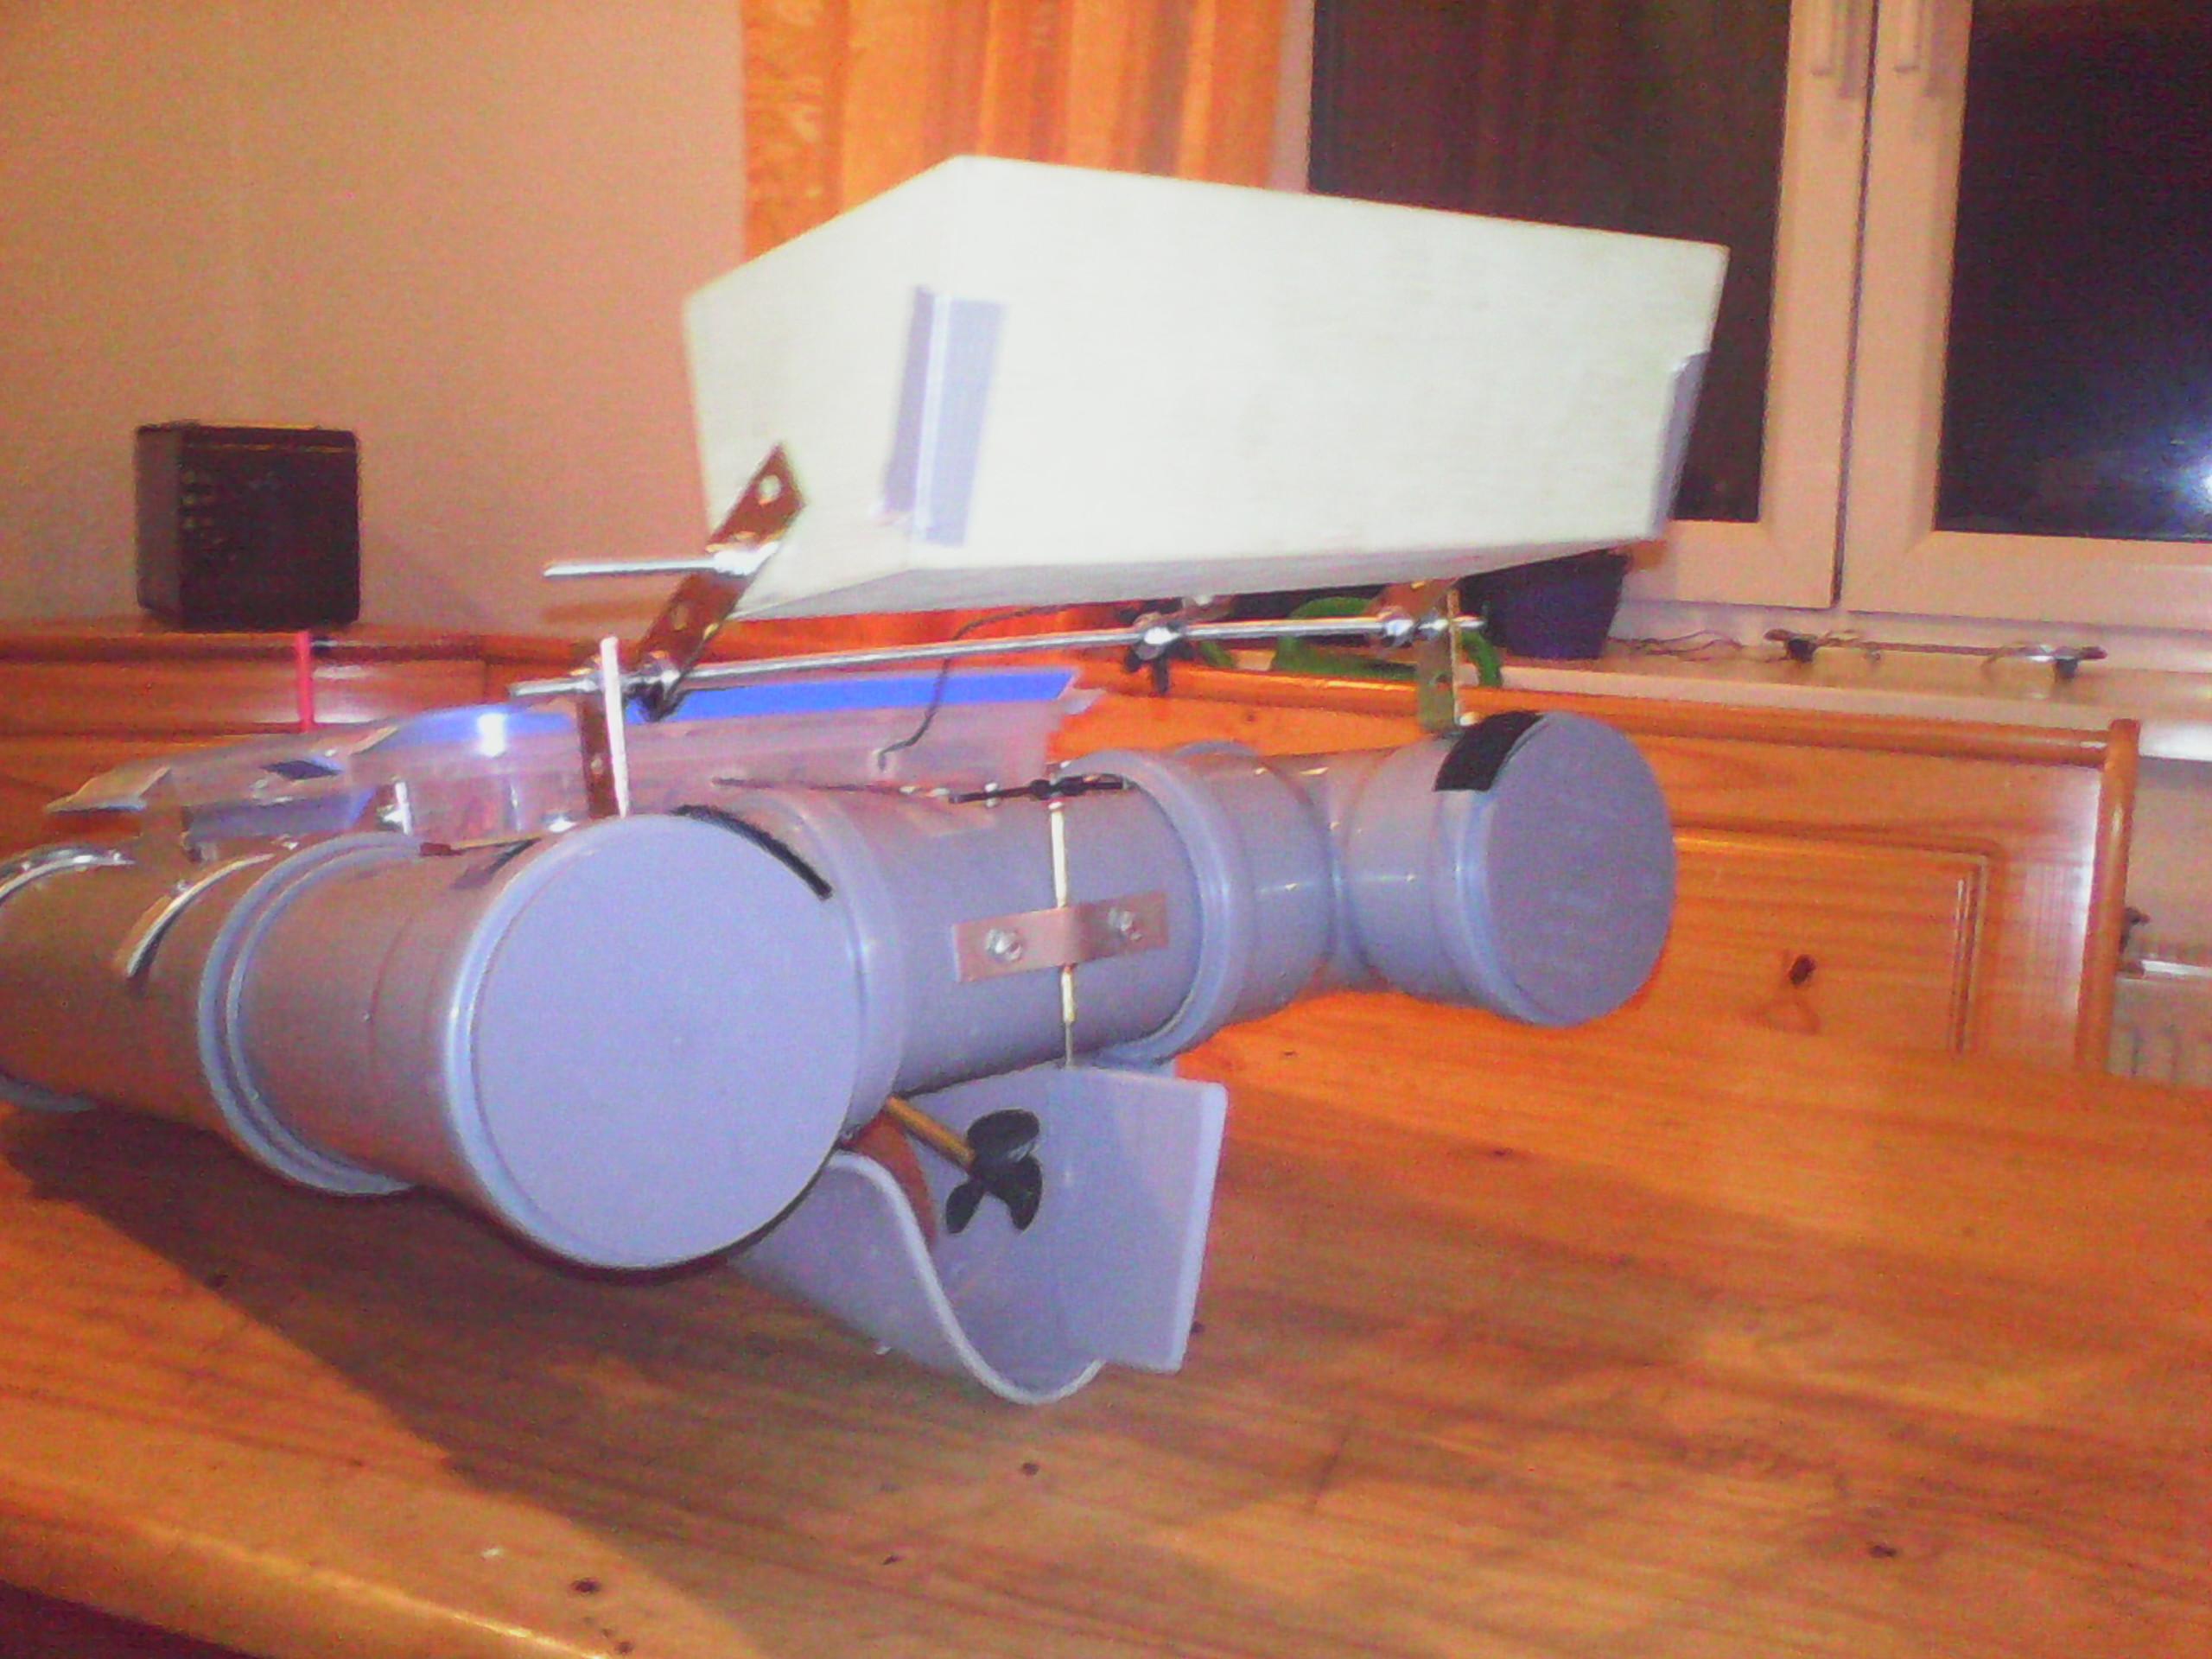 rc futterboot angeln modellbau schiff rc modellbau. Black Bedroom Furniture Sets. Home Design Ideas